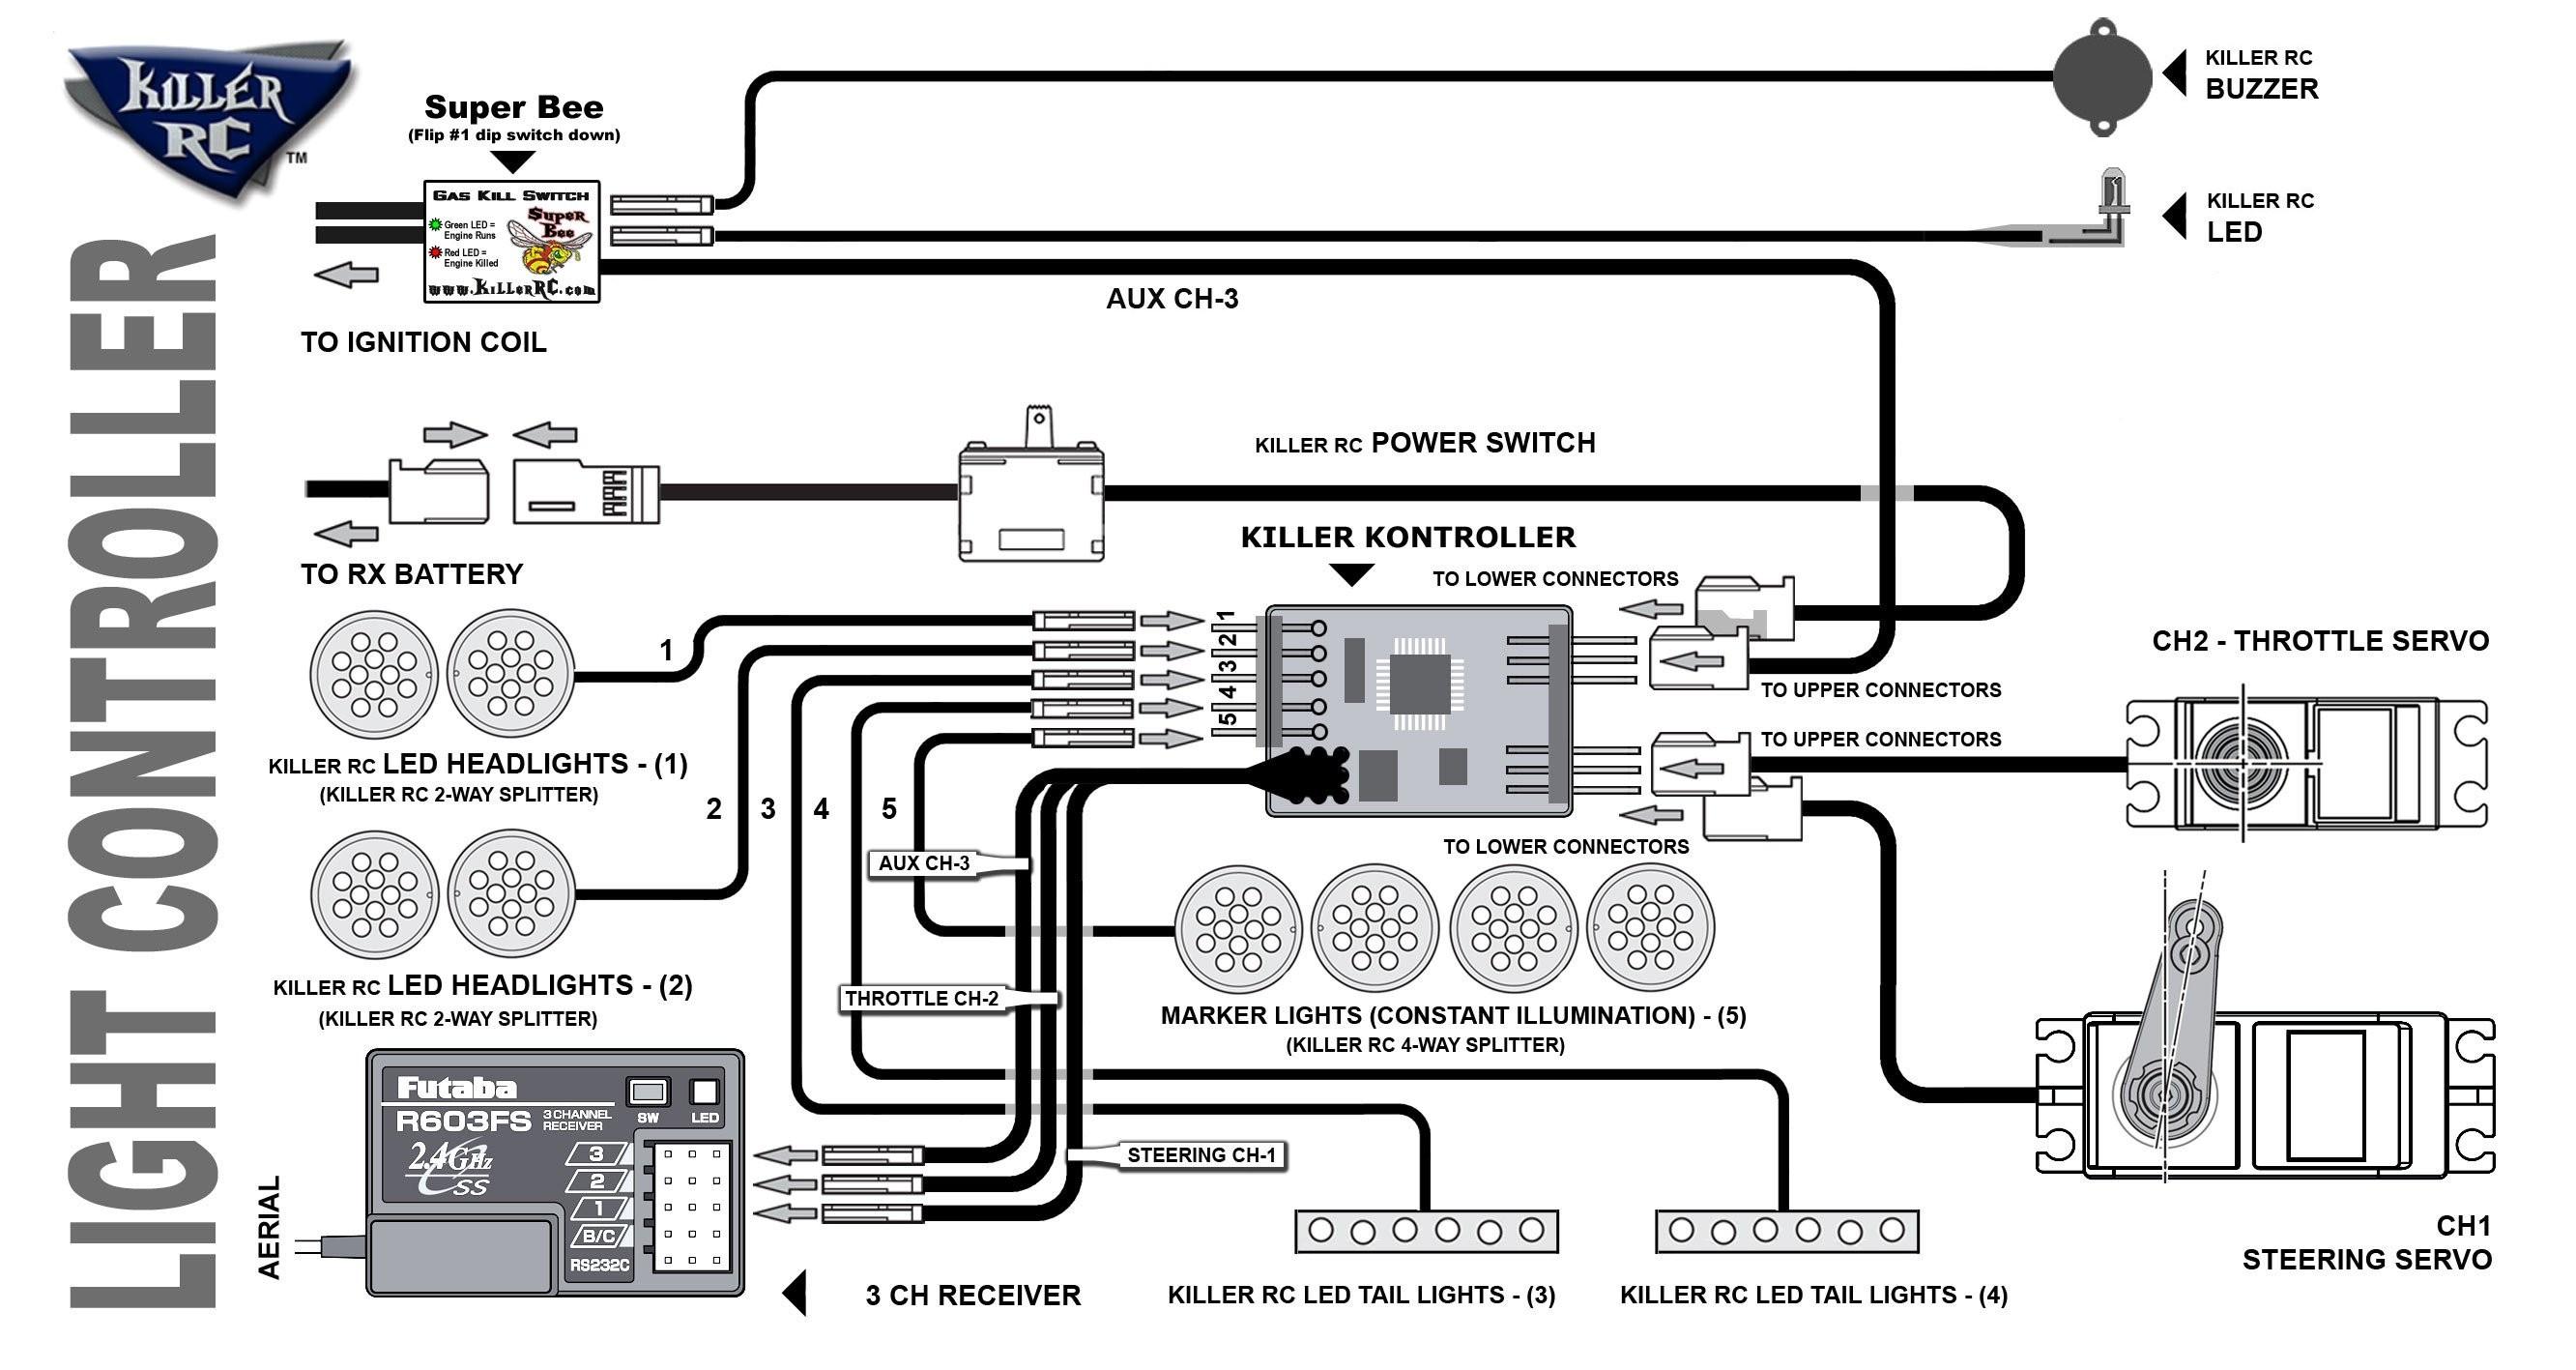 Rc Car Receiver Wiring Diagram Downloads – Killer Rc Of Rc Car Receiver Wiring Diagram